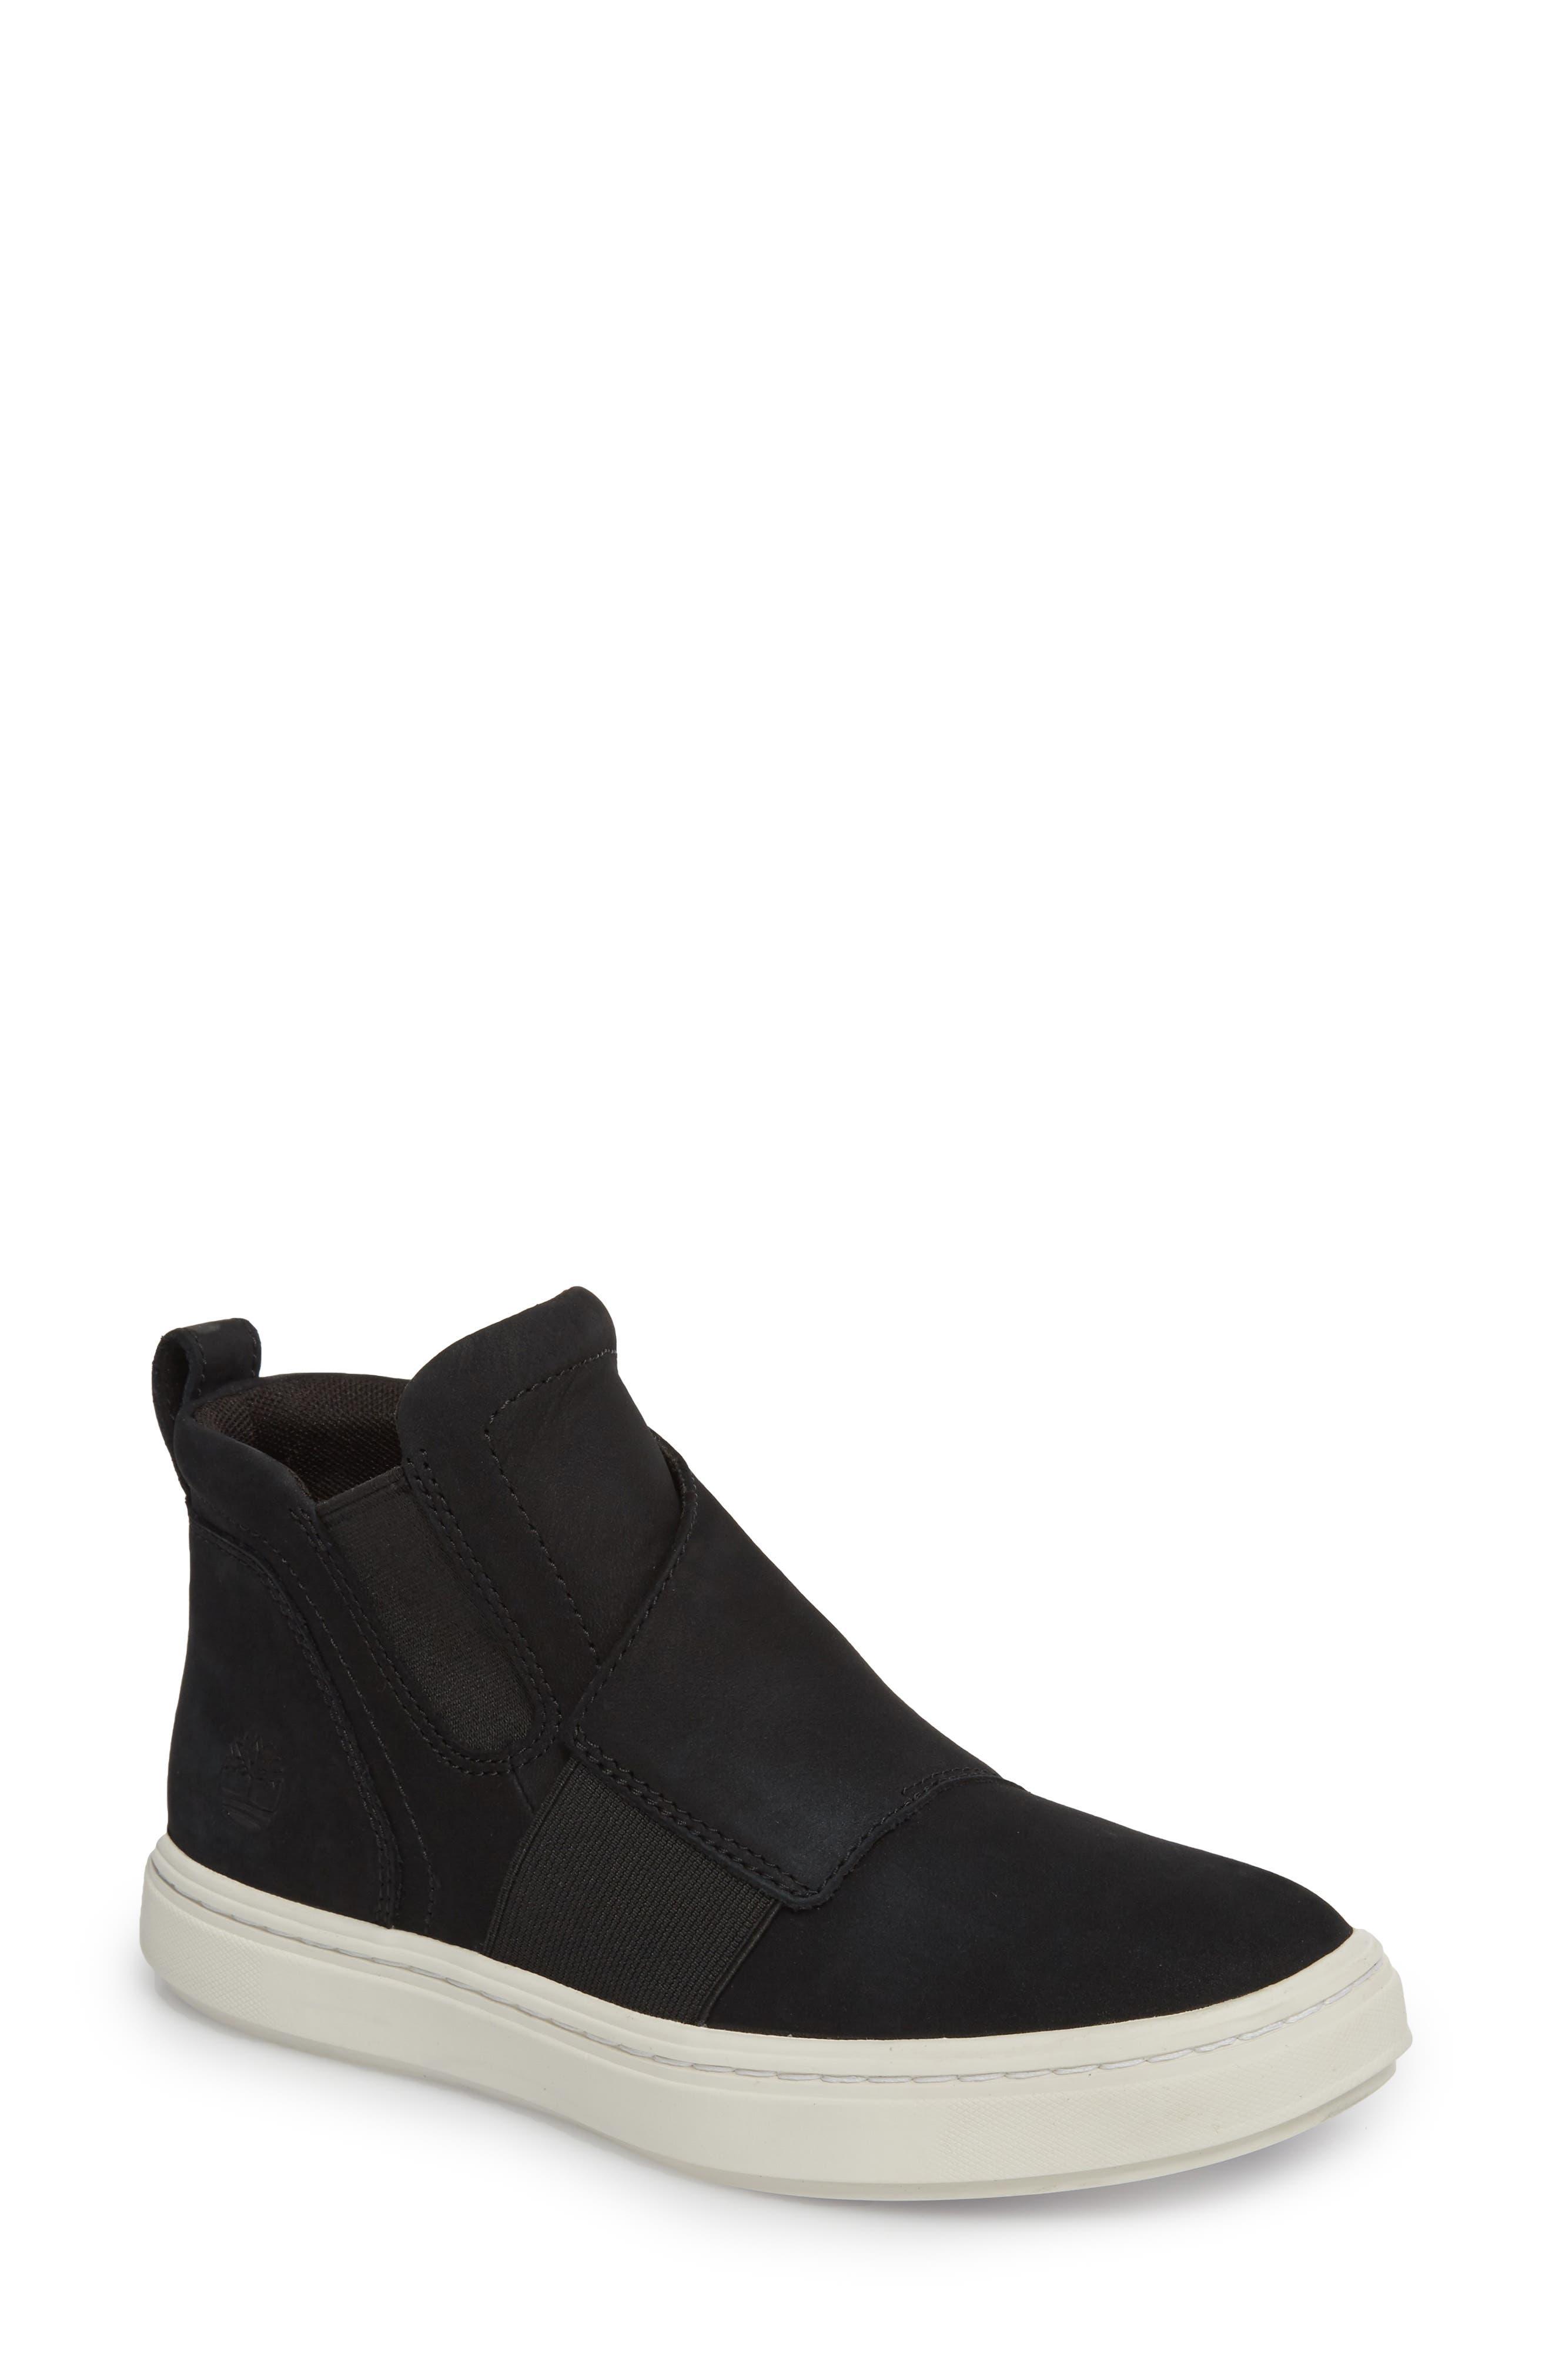 Londyn Chelsea Boot,                         Main,                         color, Black Nubuck Leather